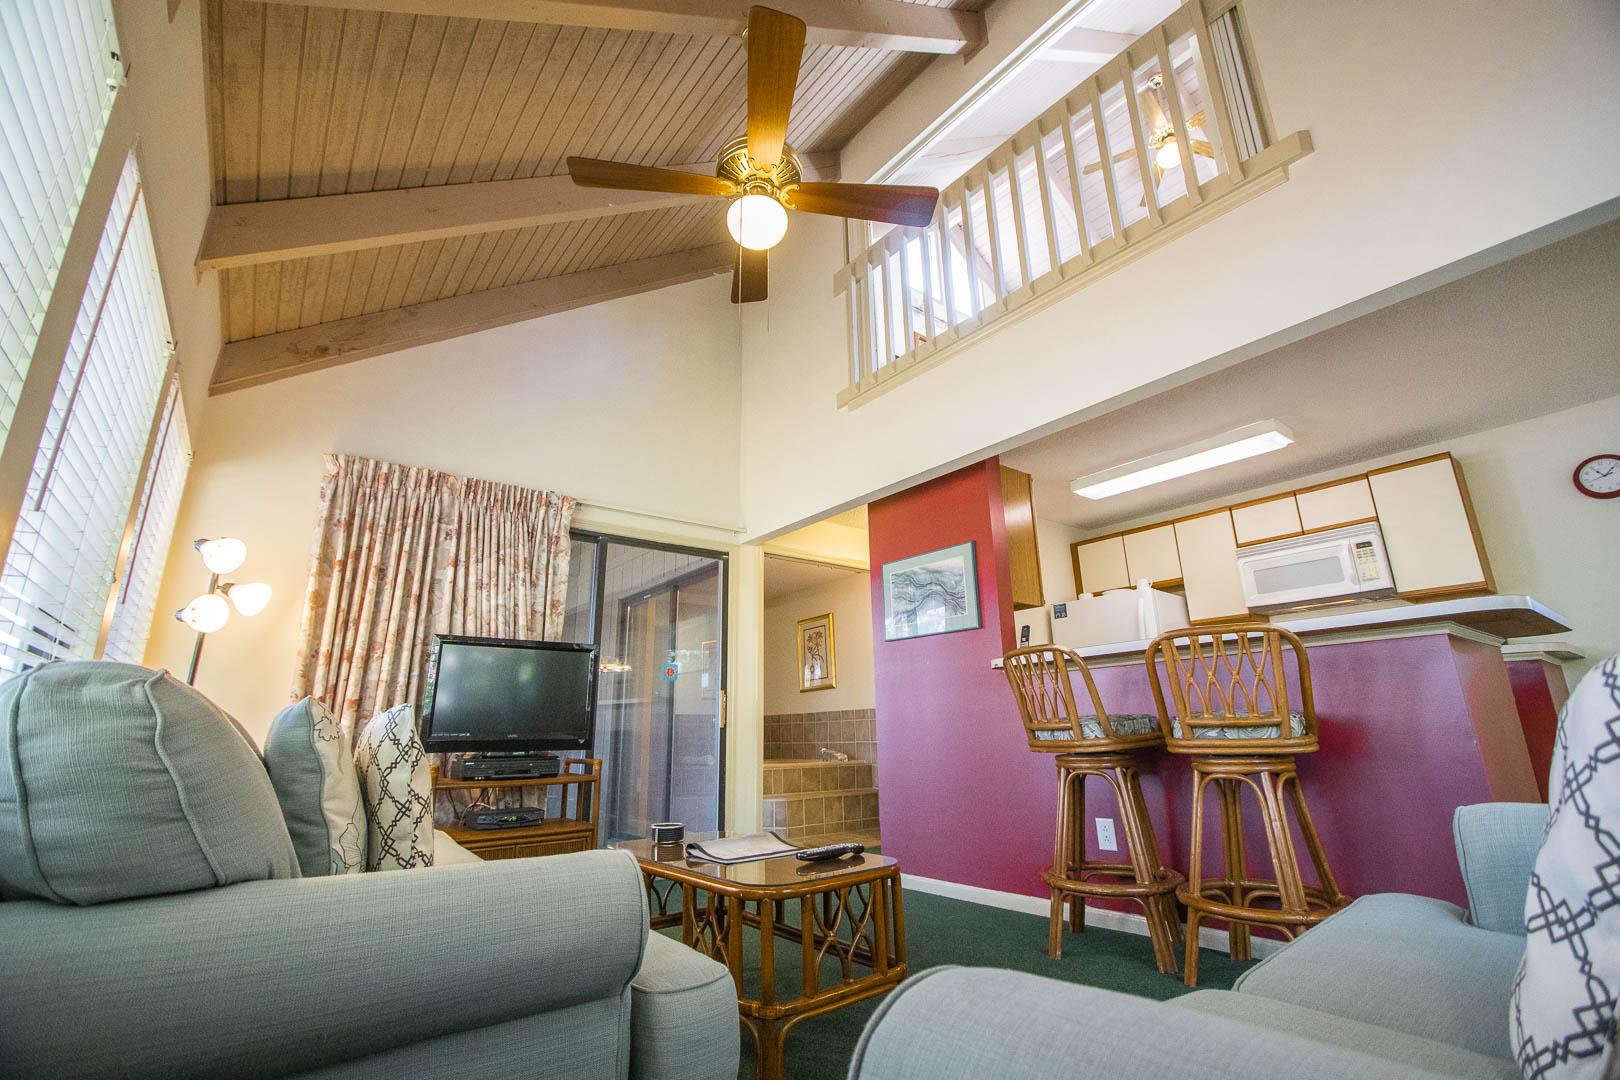 A spacious living room area at VRI's Sandcastle Cove in New Bern, North Carolina.